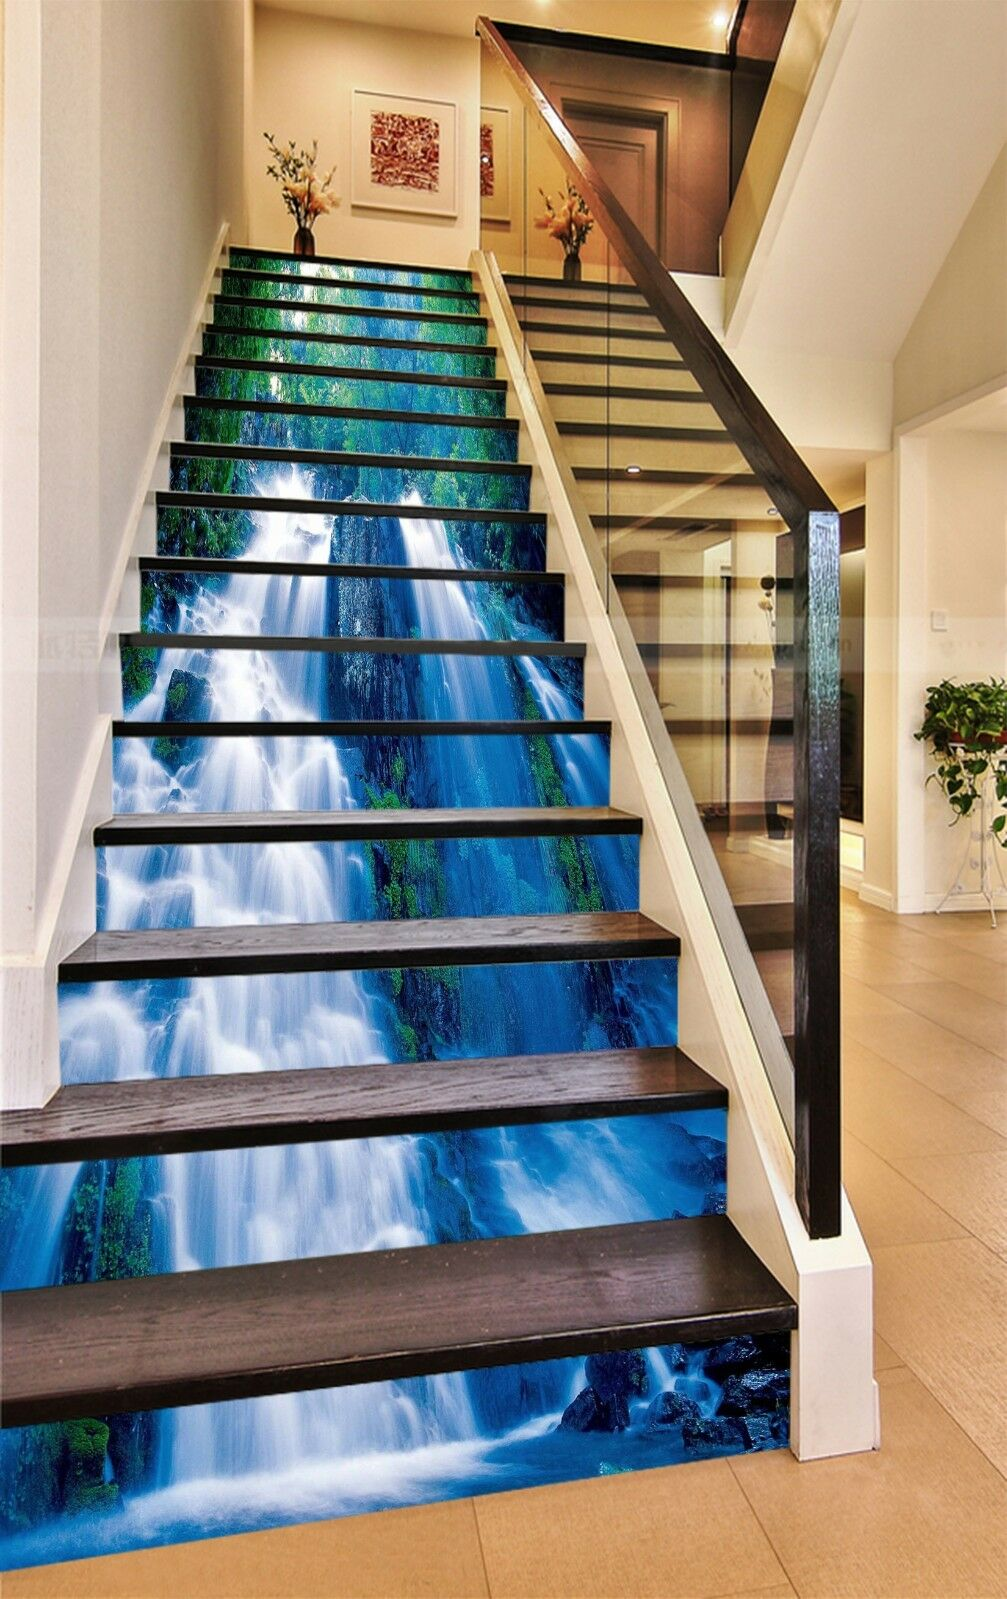 3D bluee Cascade Stair Risers Decoration Photo Mural Vinyl Decal Wallpaper AU